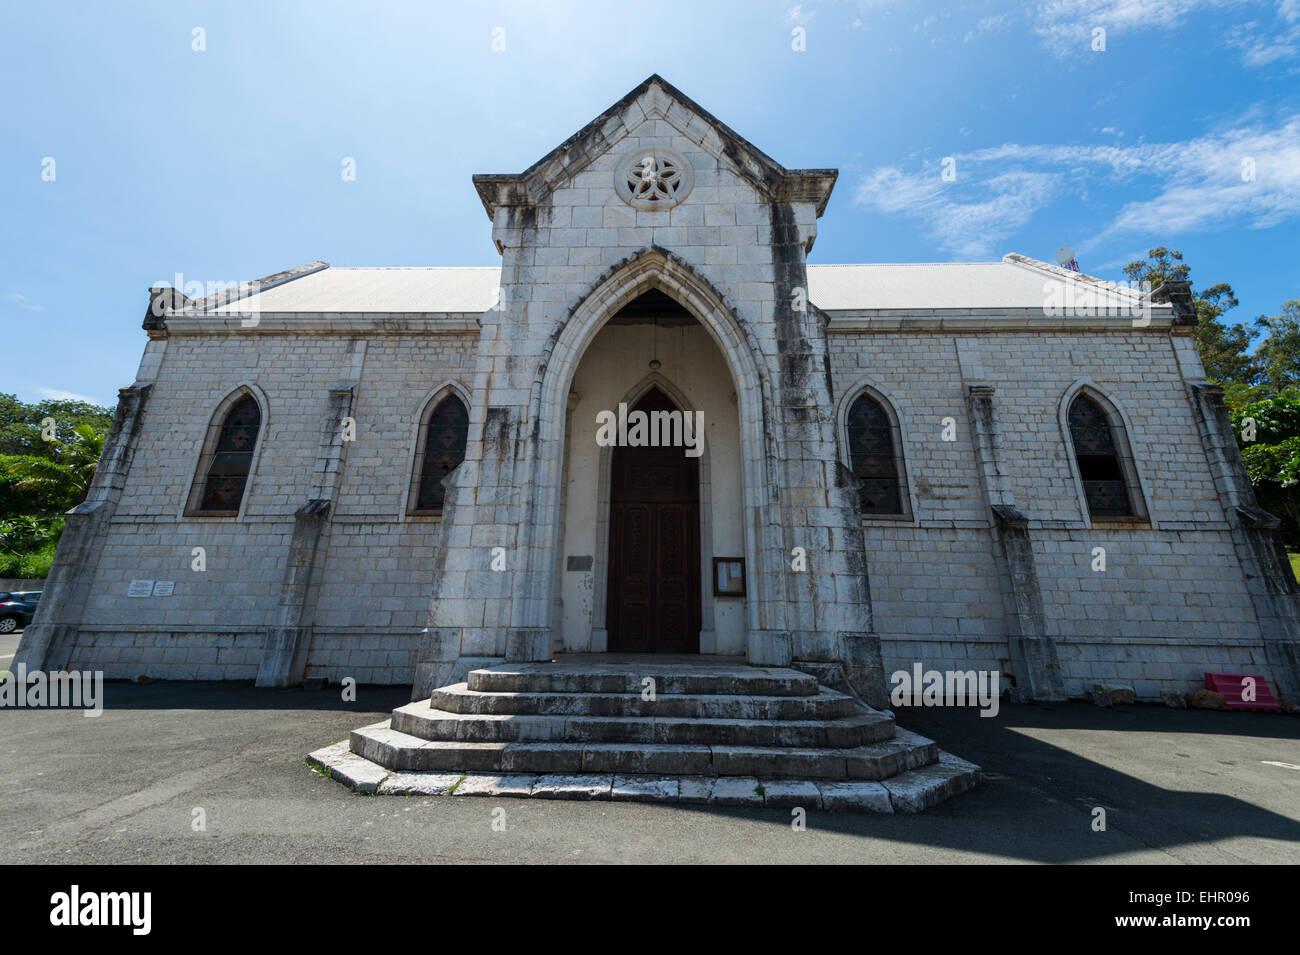 Noumea Church new Caledonia. - Stock Image